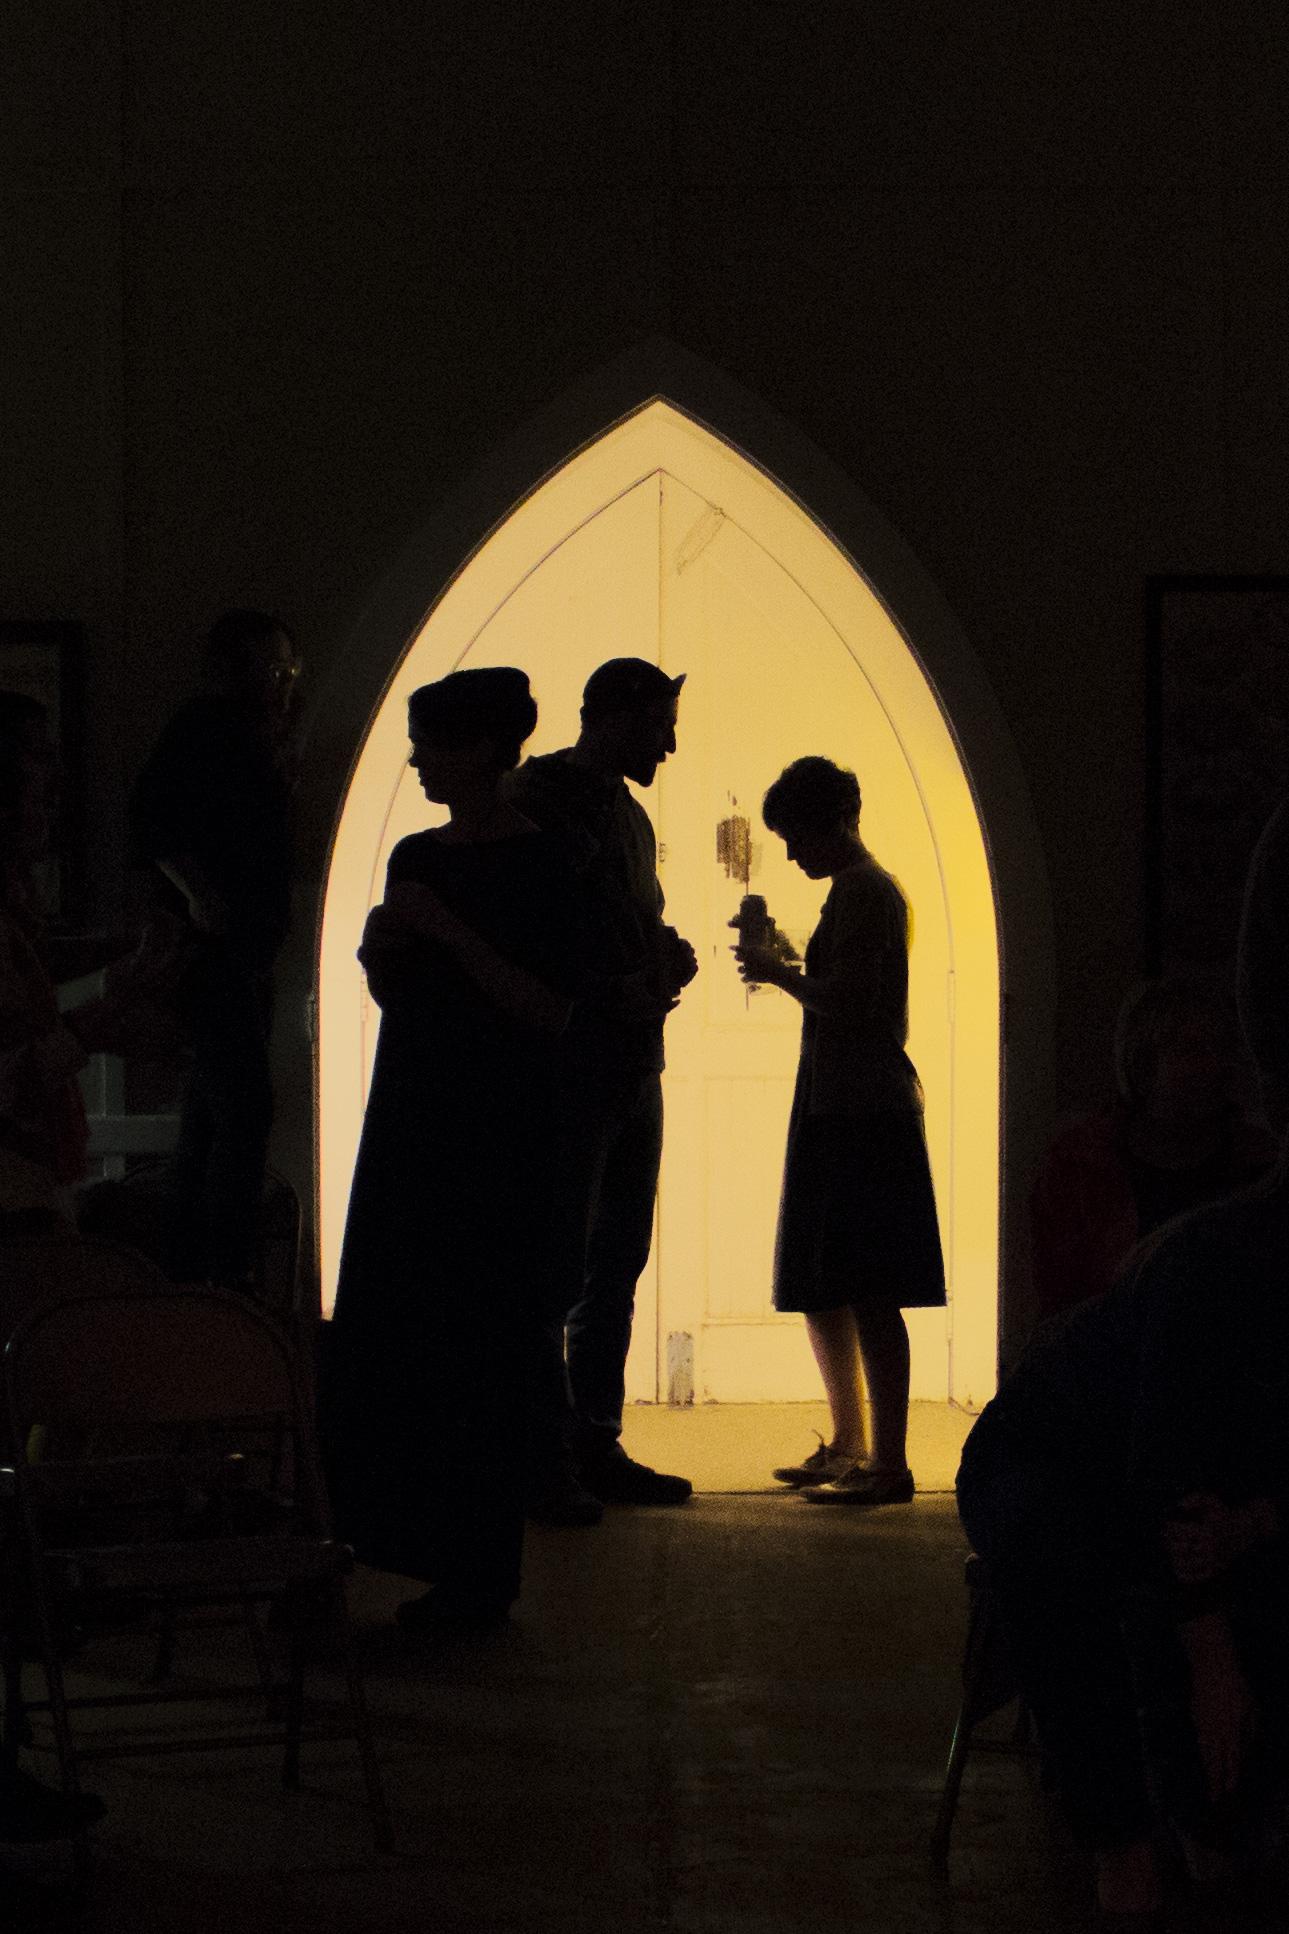 Odd Fellows Hall (Blacksburg, VA) on 10/13/18.